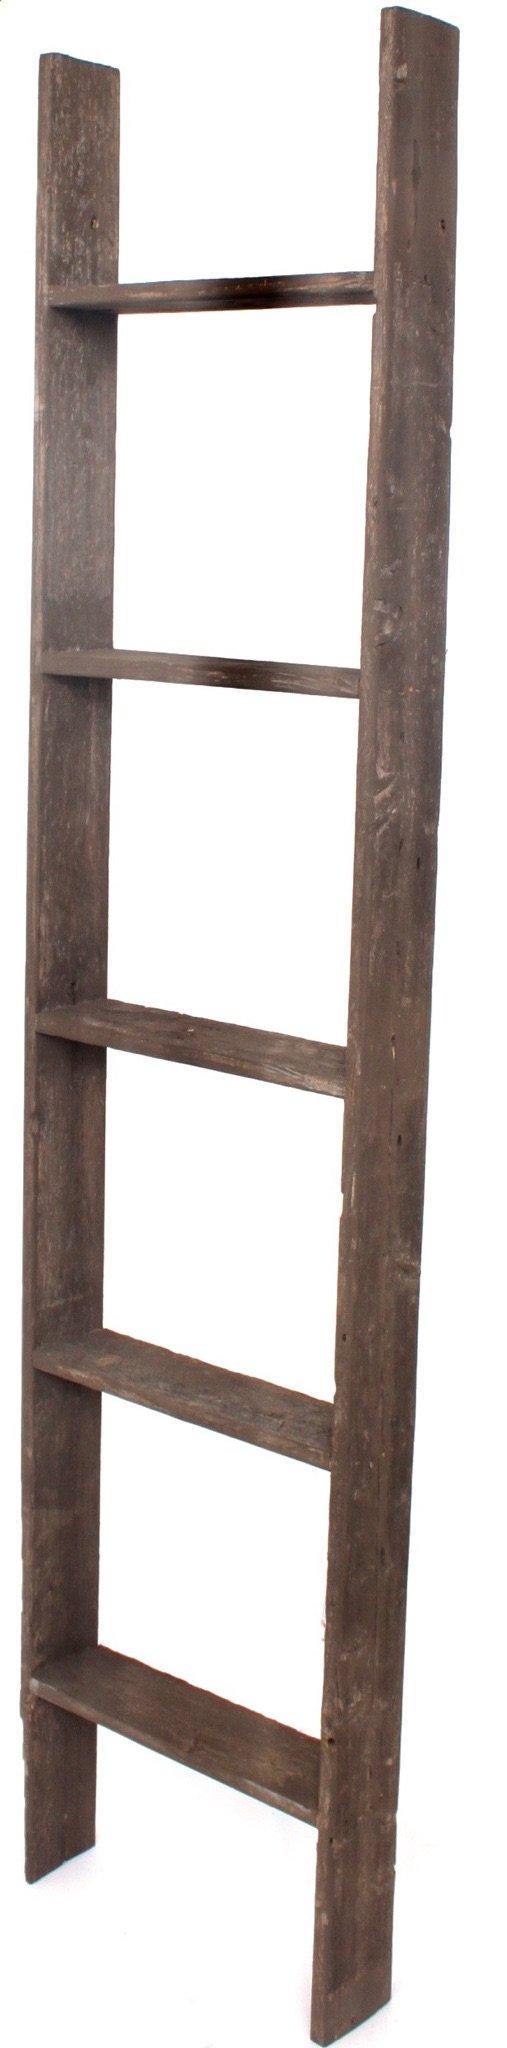 BarnwoodUSA Rustic 5 Foot Decorative Wooden Display Ladder - 100% Reclaimed Wood, Brown